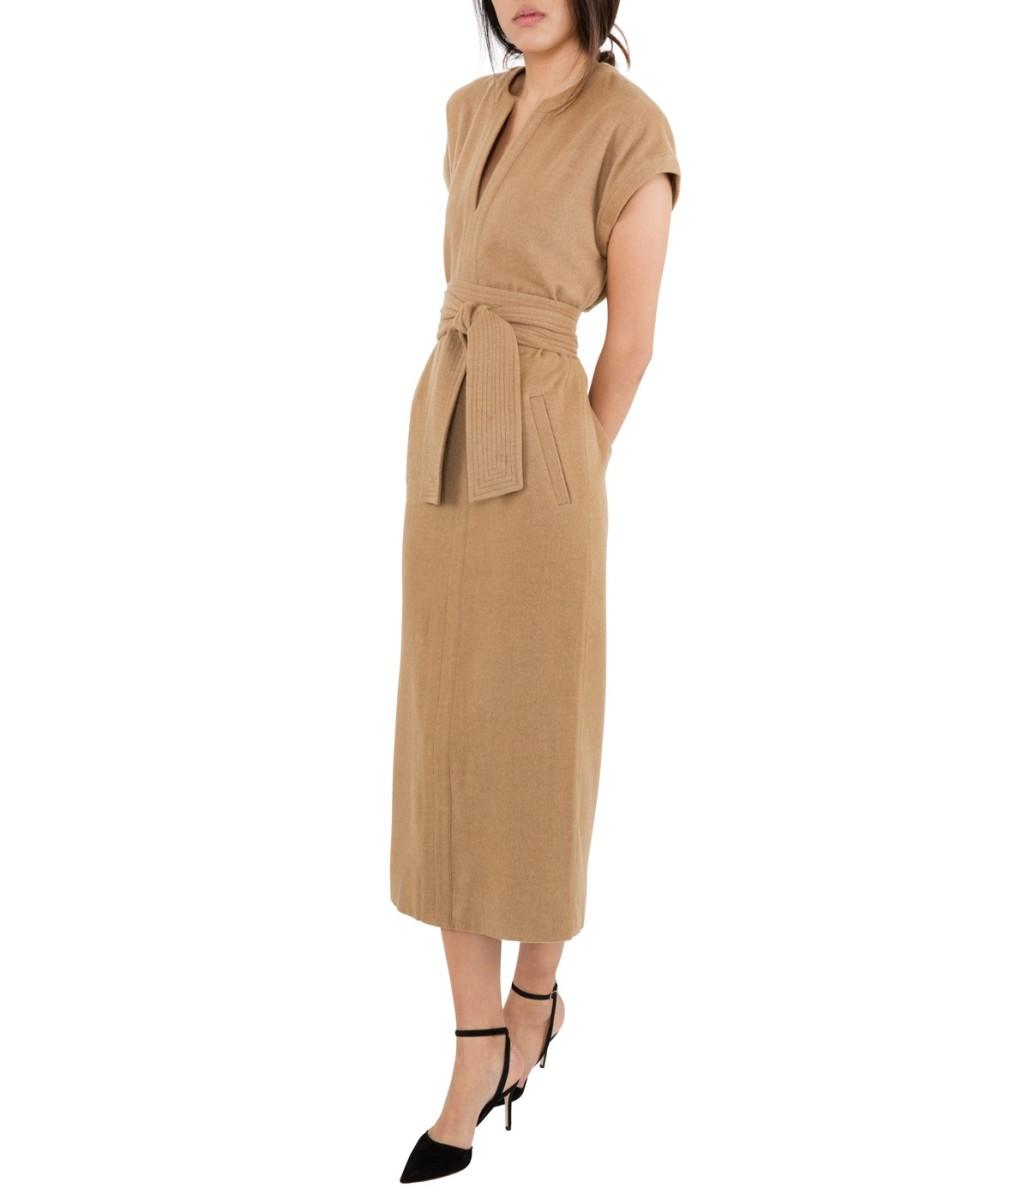 Ann Mashburn dress, $495, available at Ann Mashburn